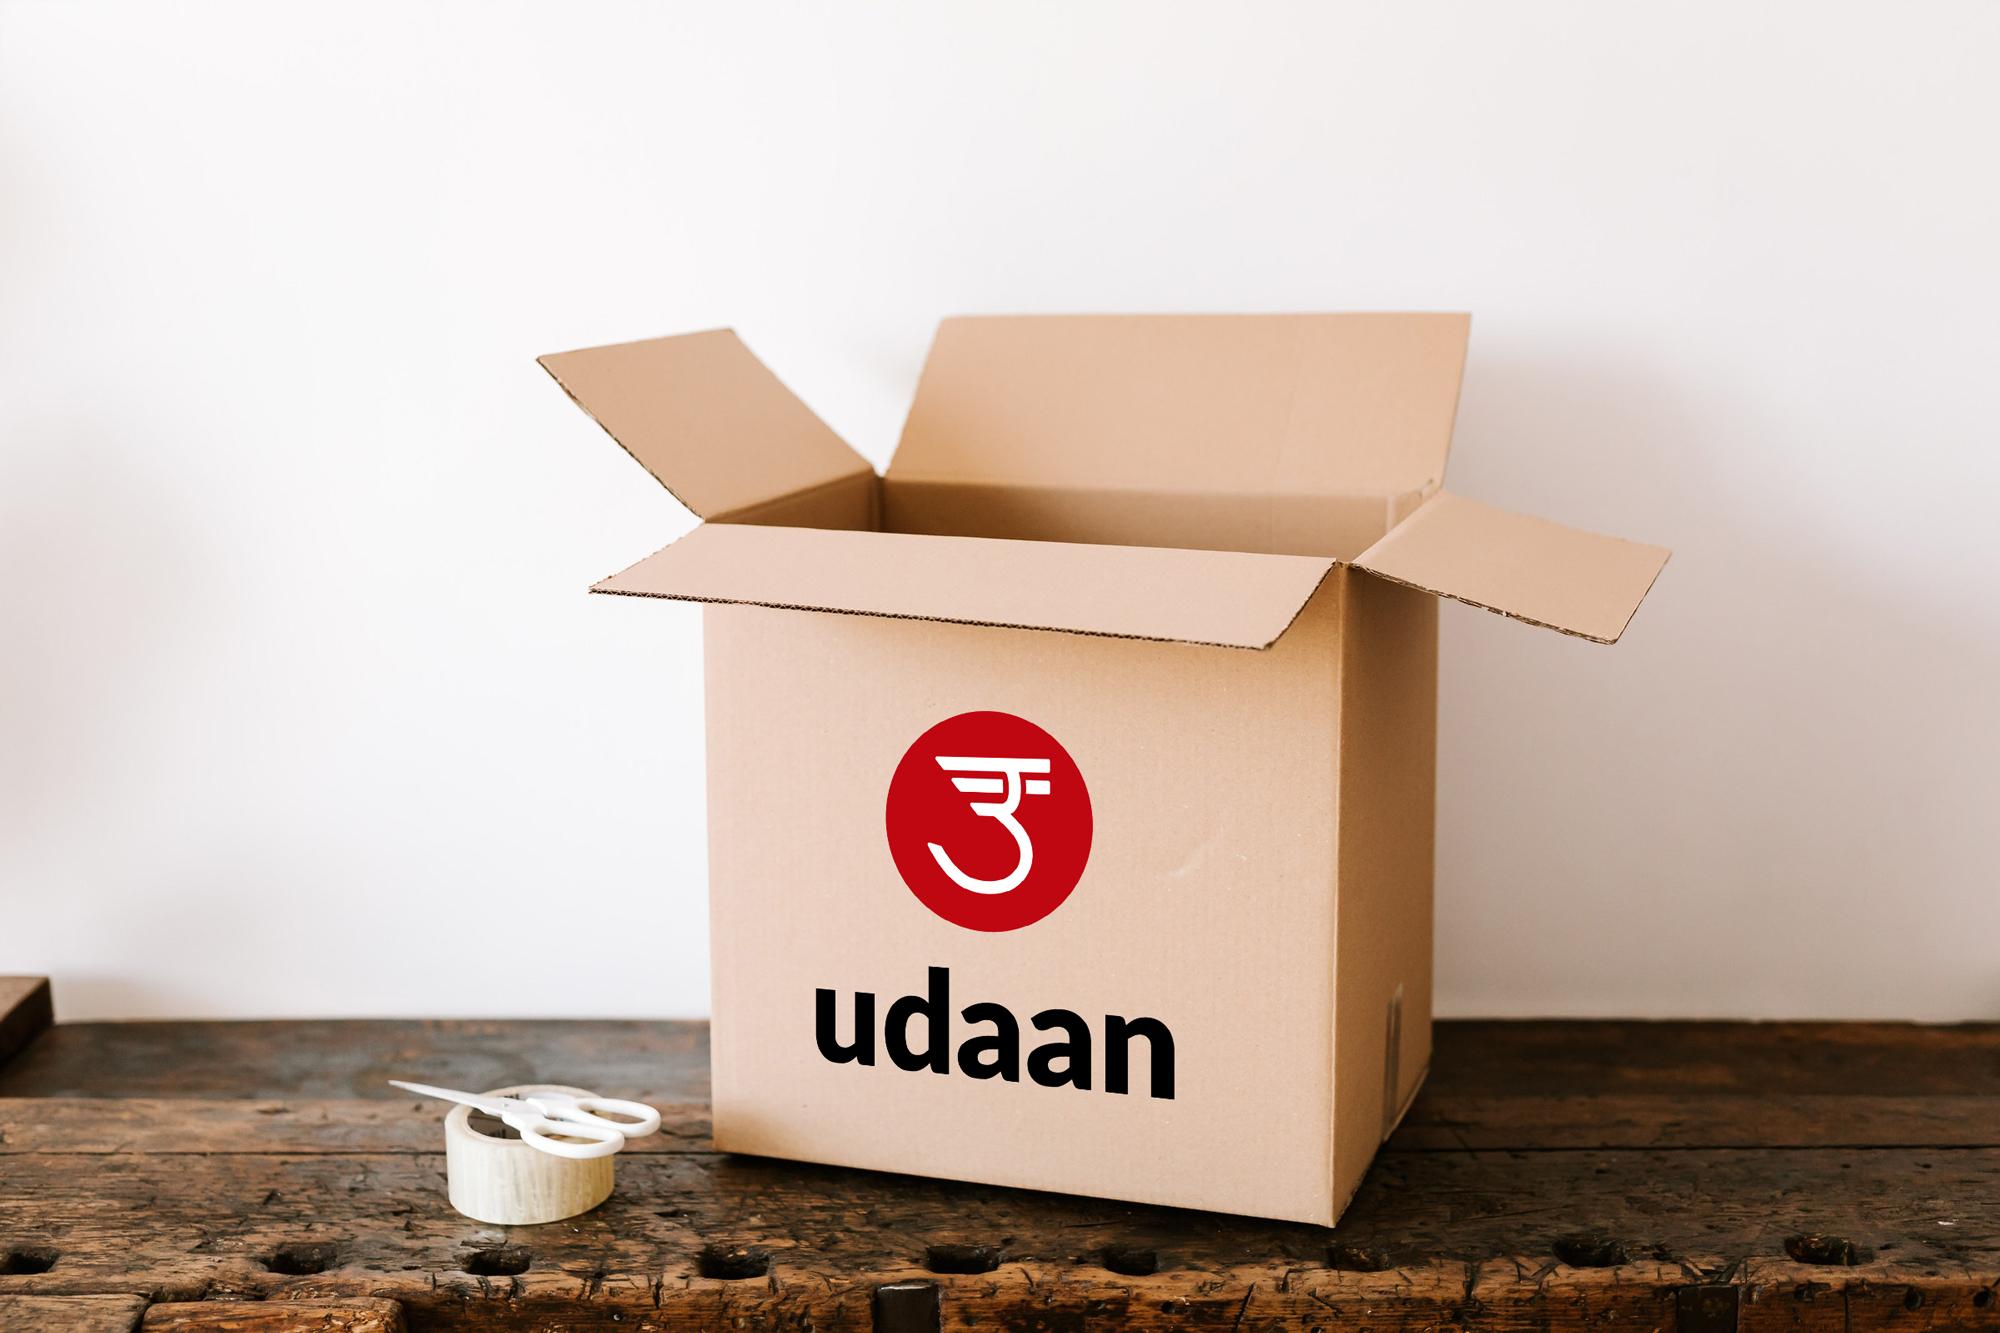 Udaan box on dark wooden table near tape and scissors